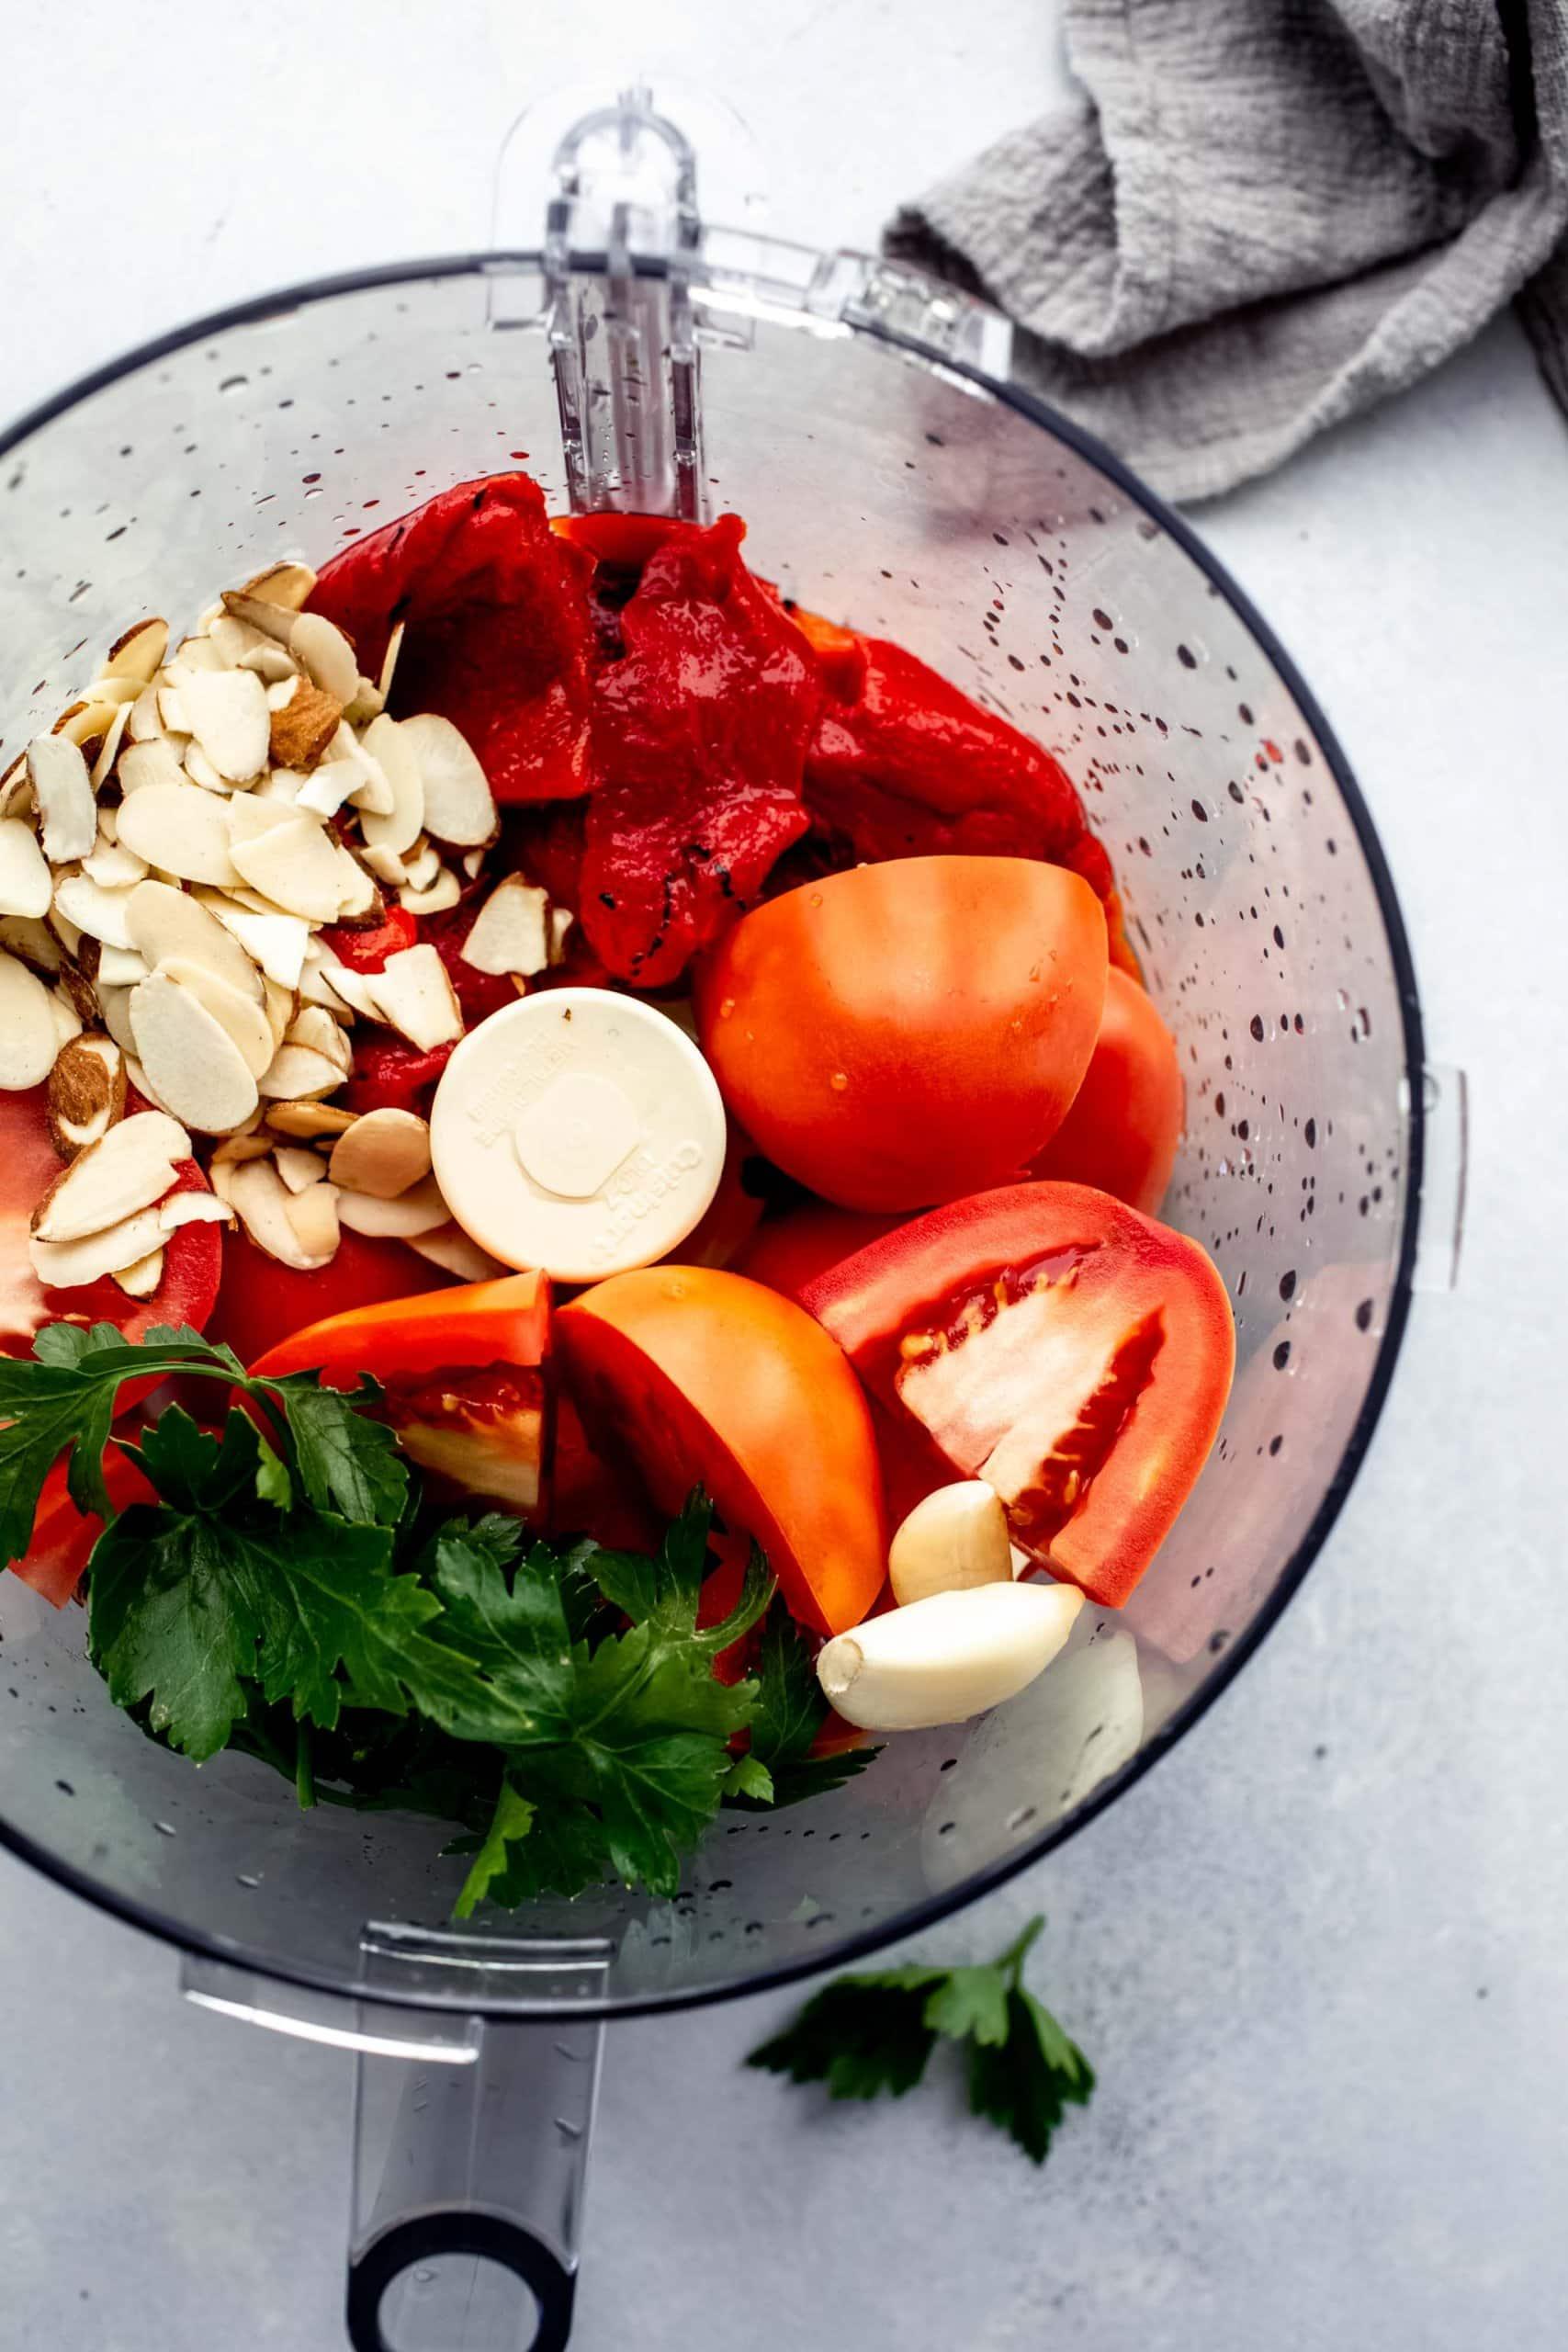 Ingredients for romesco sauce in food processor.